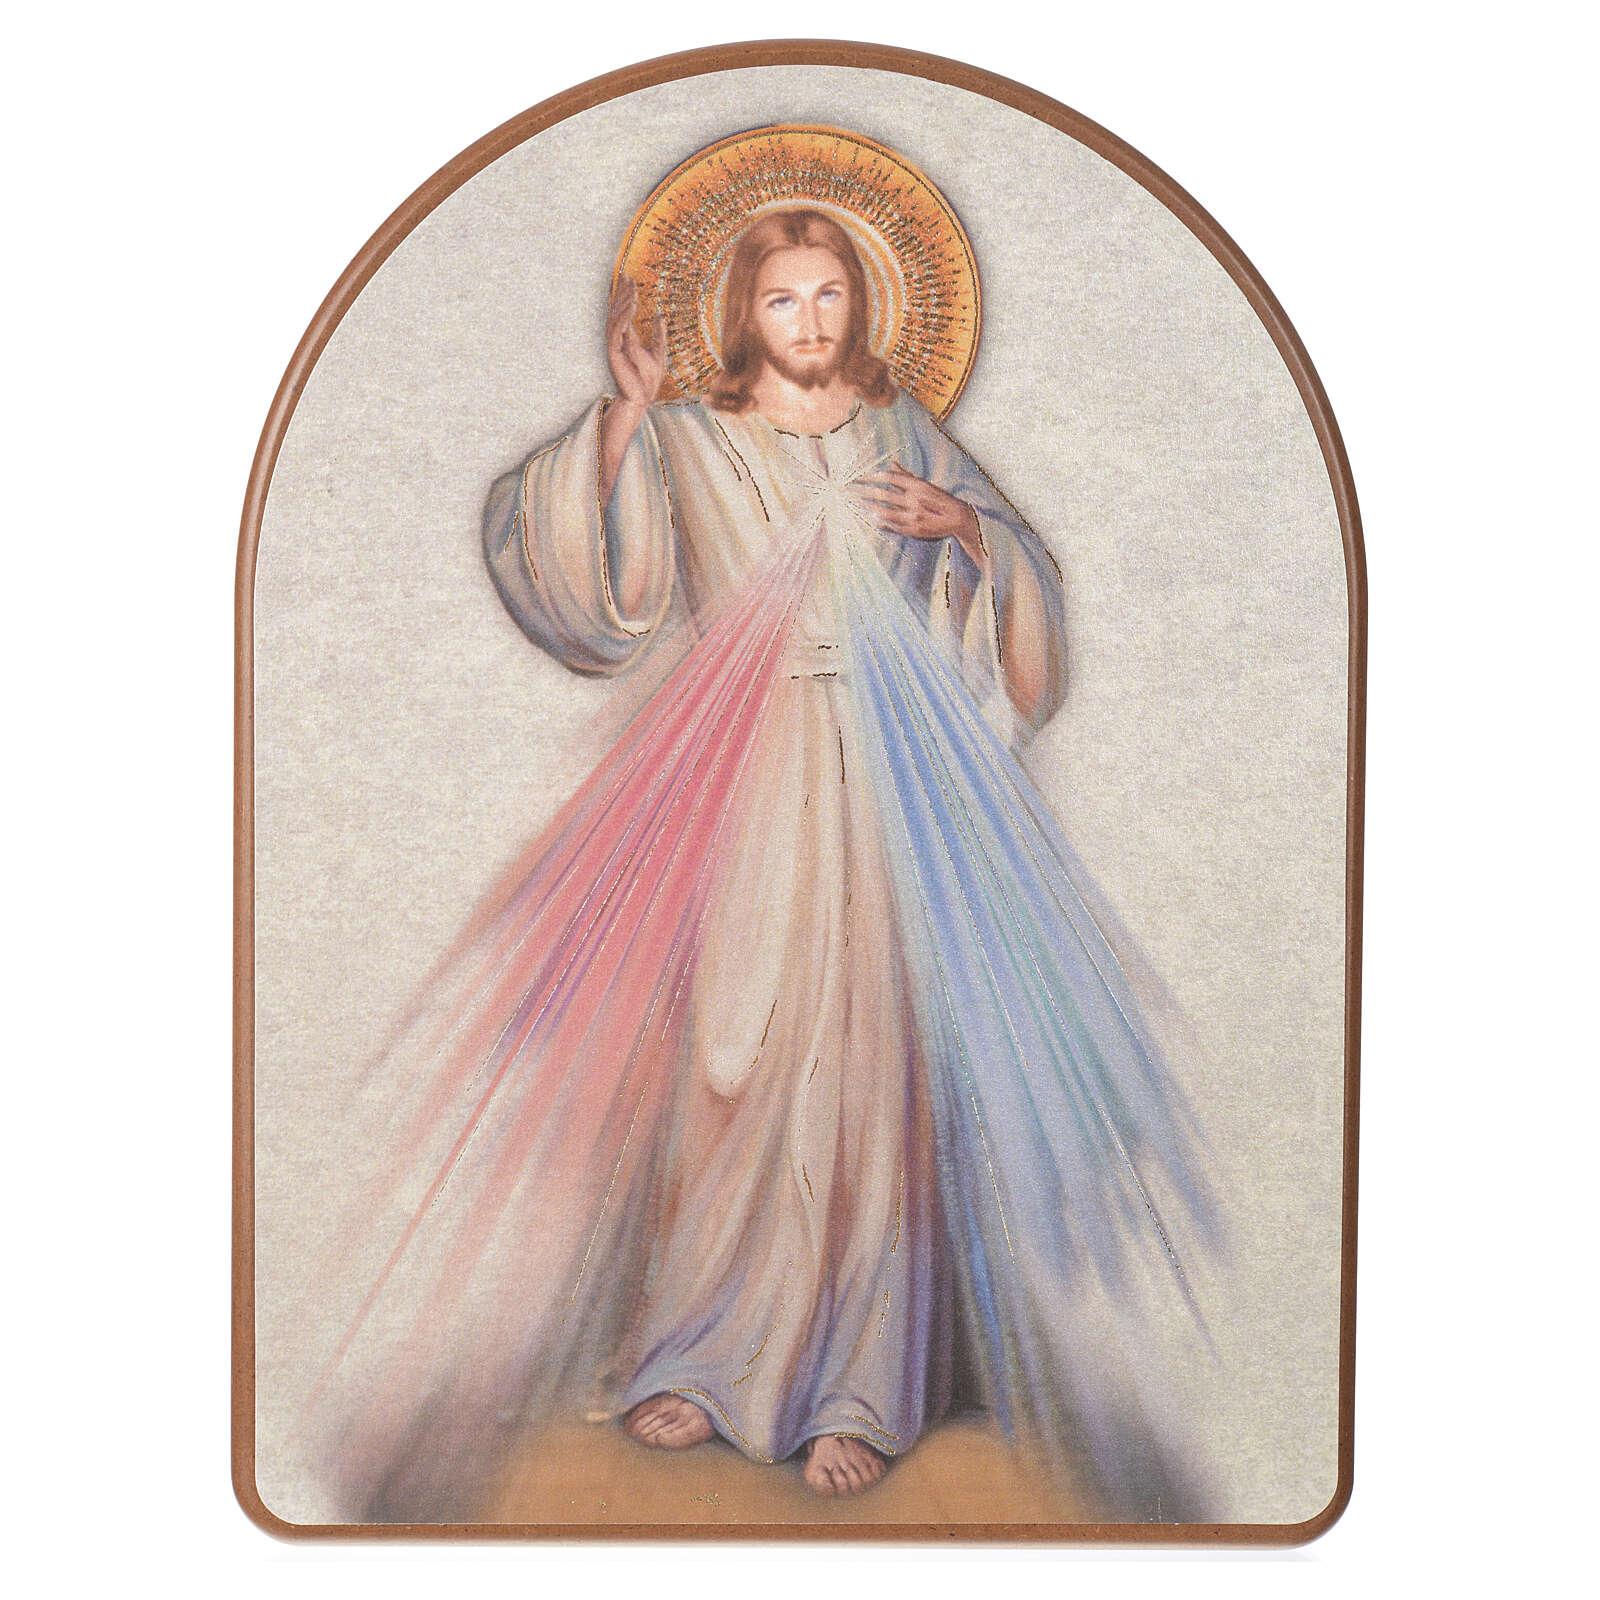 Impressão na madeira 15x20 cm Cristo Misericordioso 3